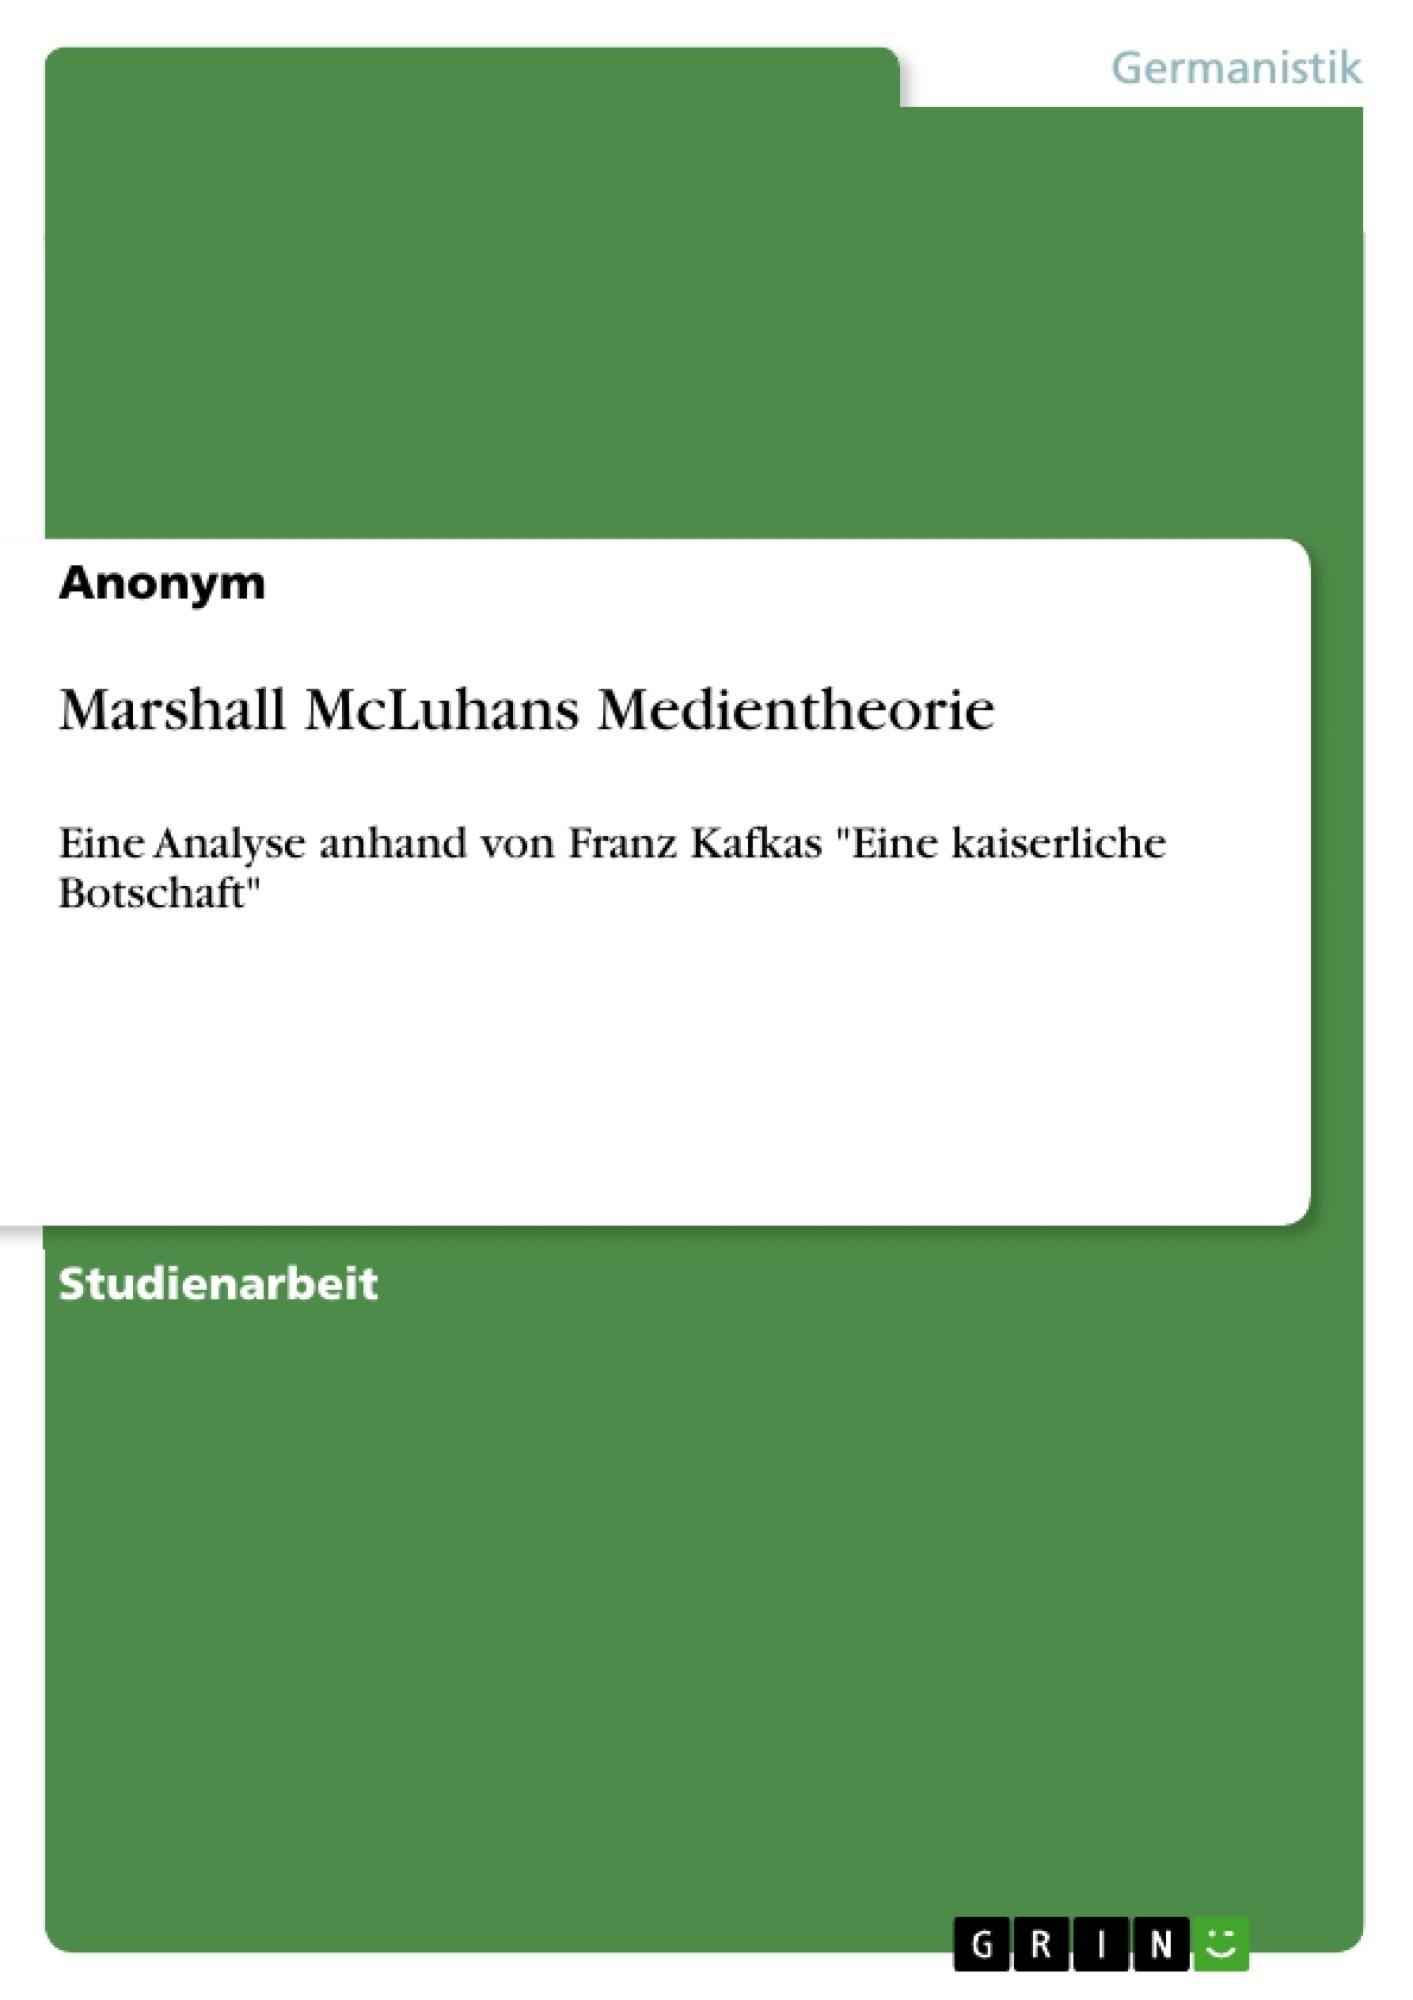 Titel: Marshall McLuhans Medientheorie